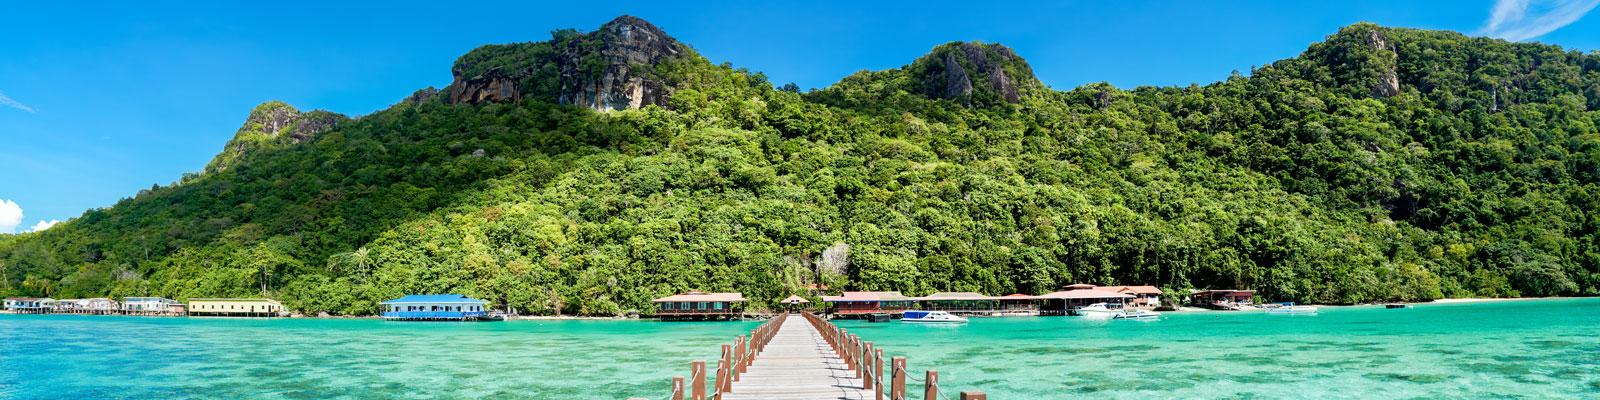 Malaysia Vegan Travel Guide